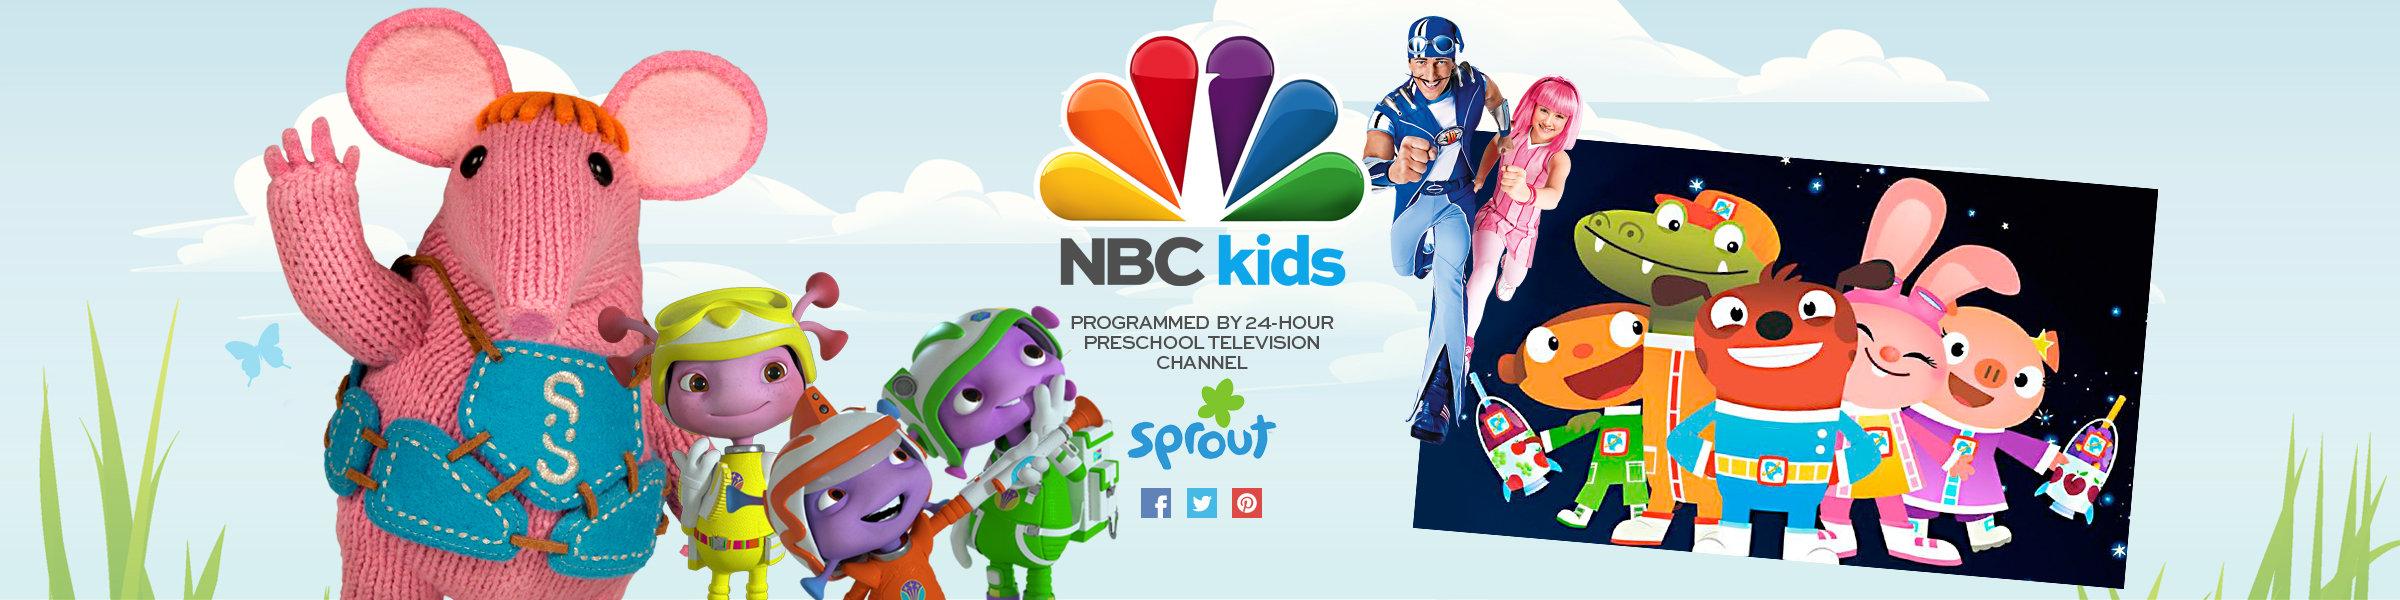 Saturday Mornings on NBC